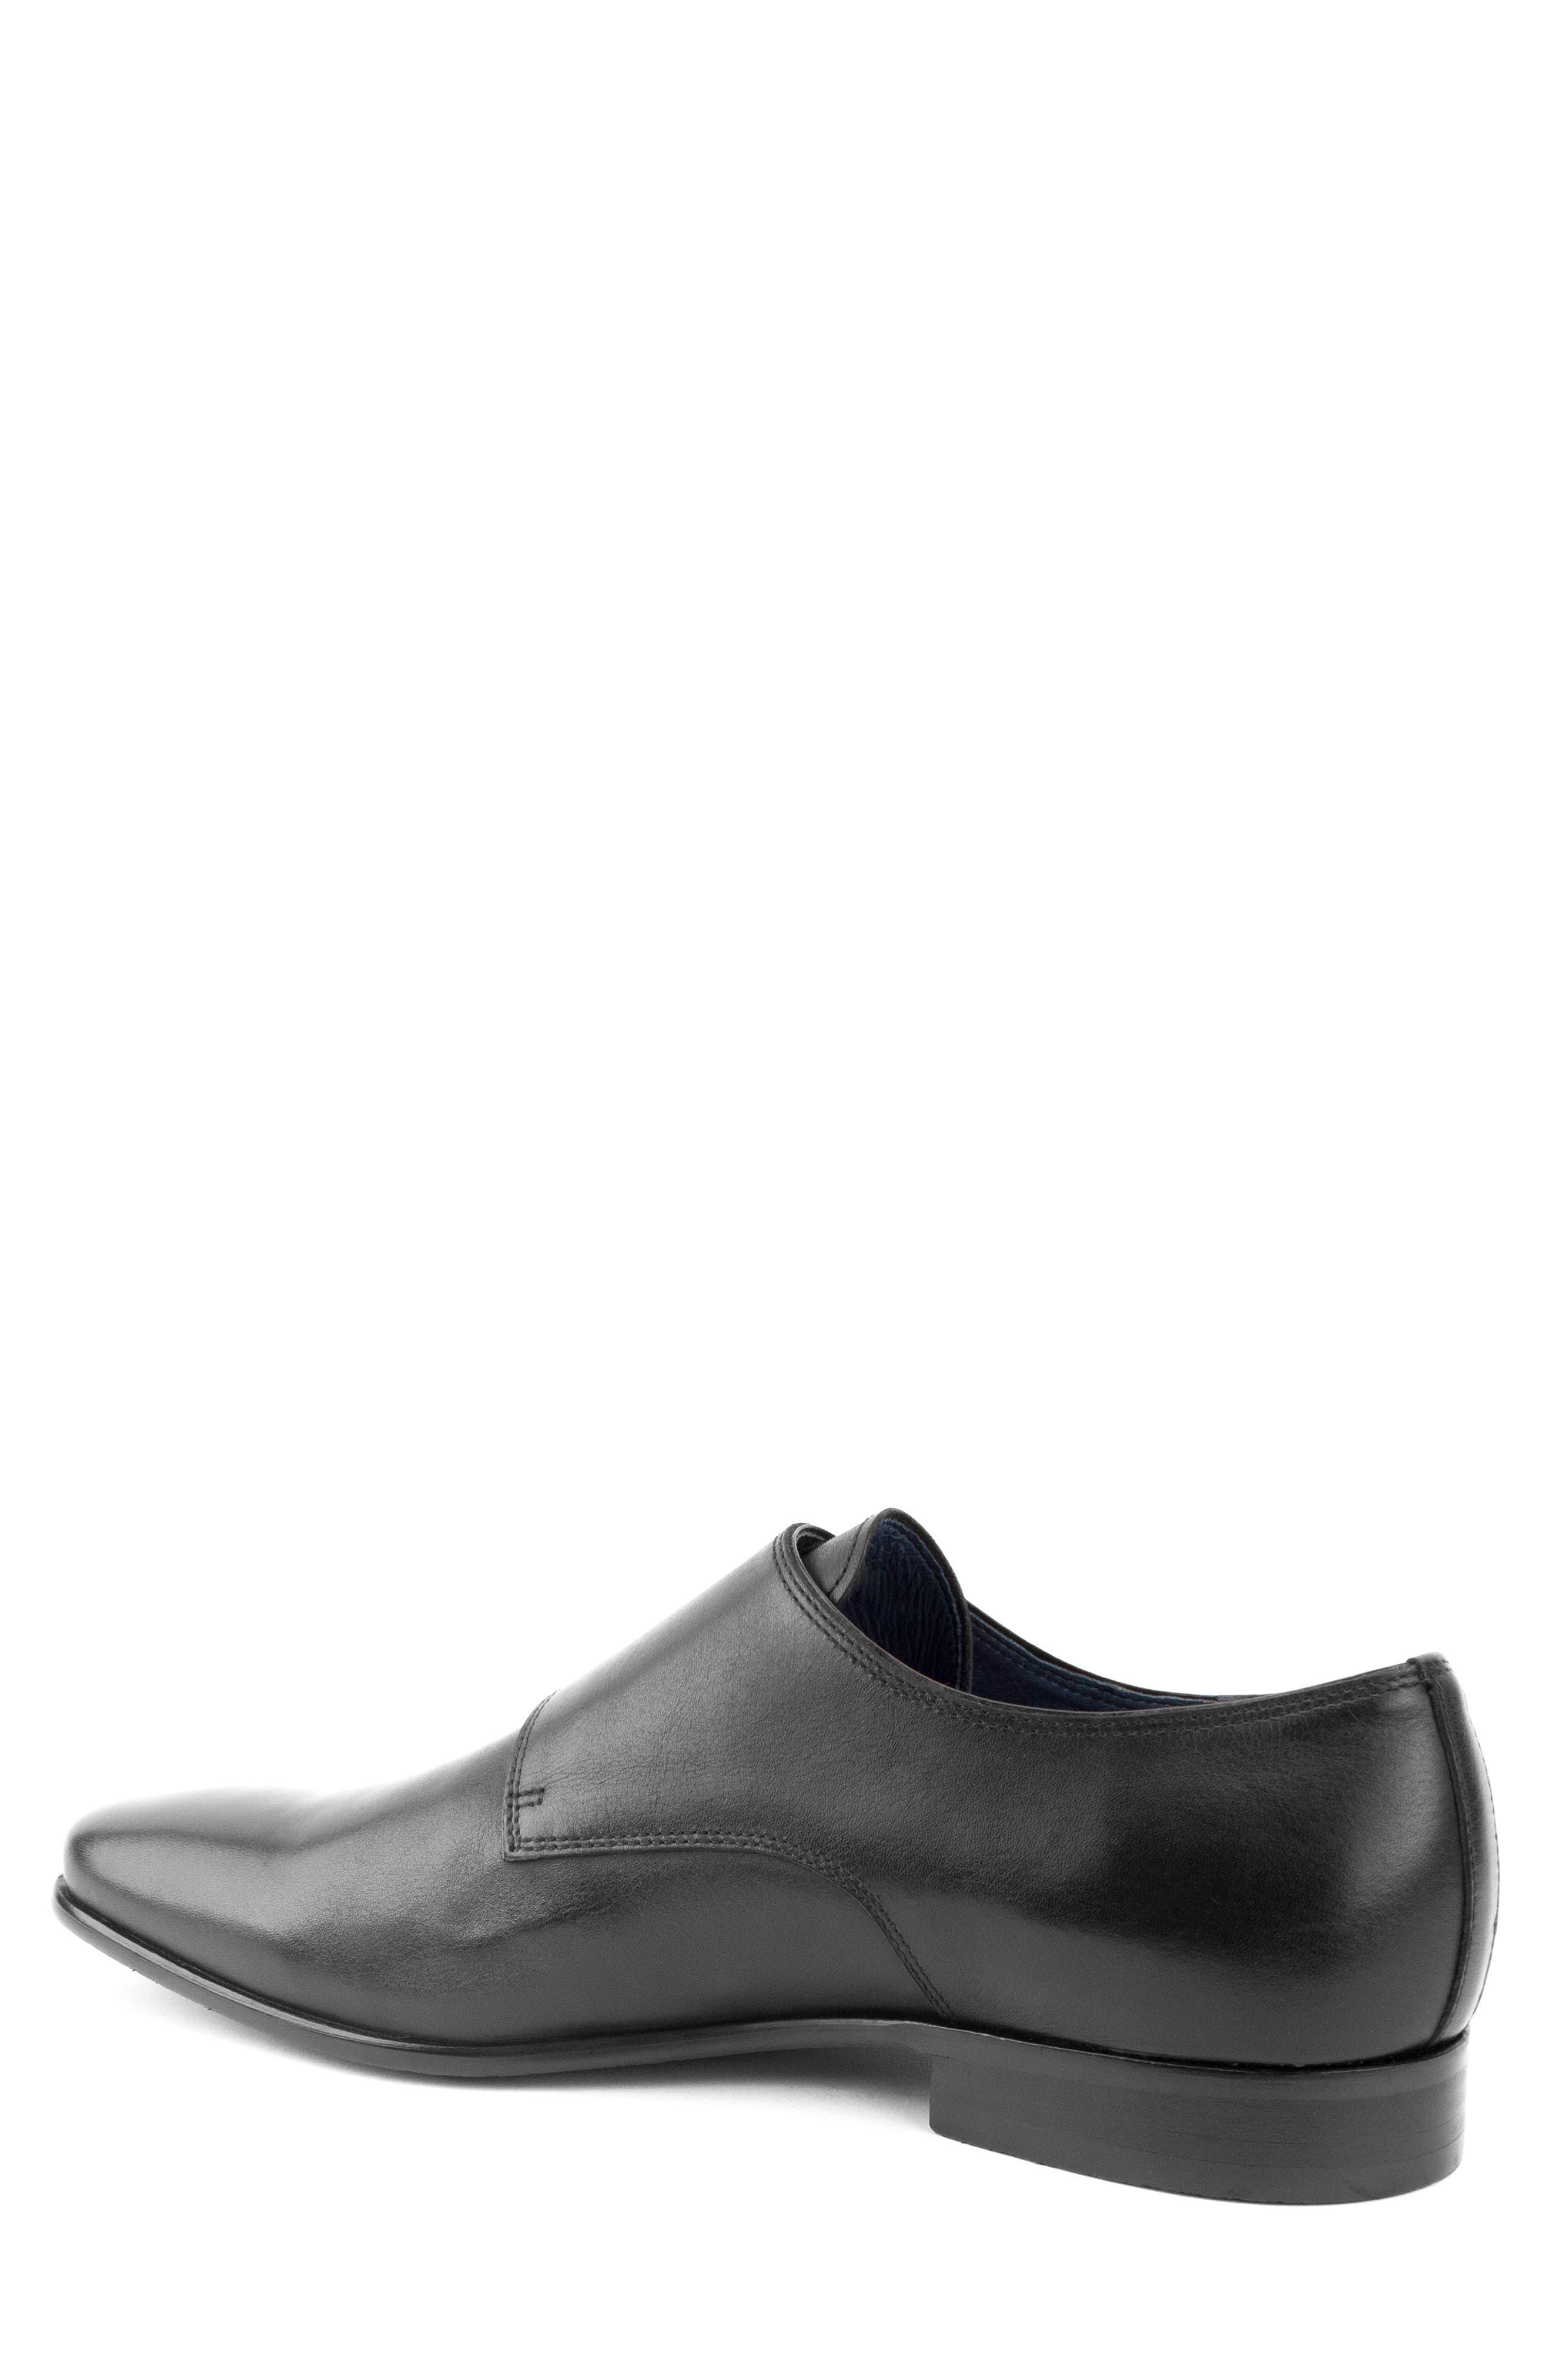 Luke Double Buckle Monk Shoe,                             Alternate thumbnail 2, color,                             BLACK LEATHER